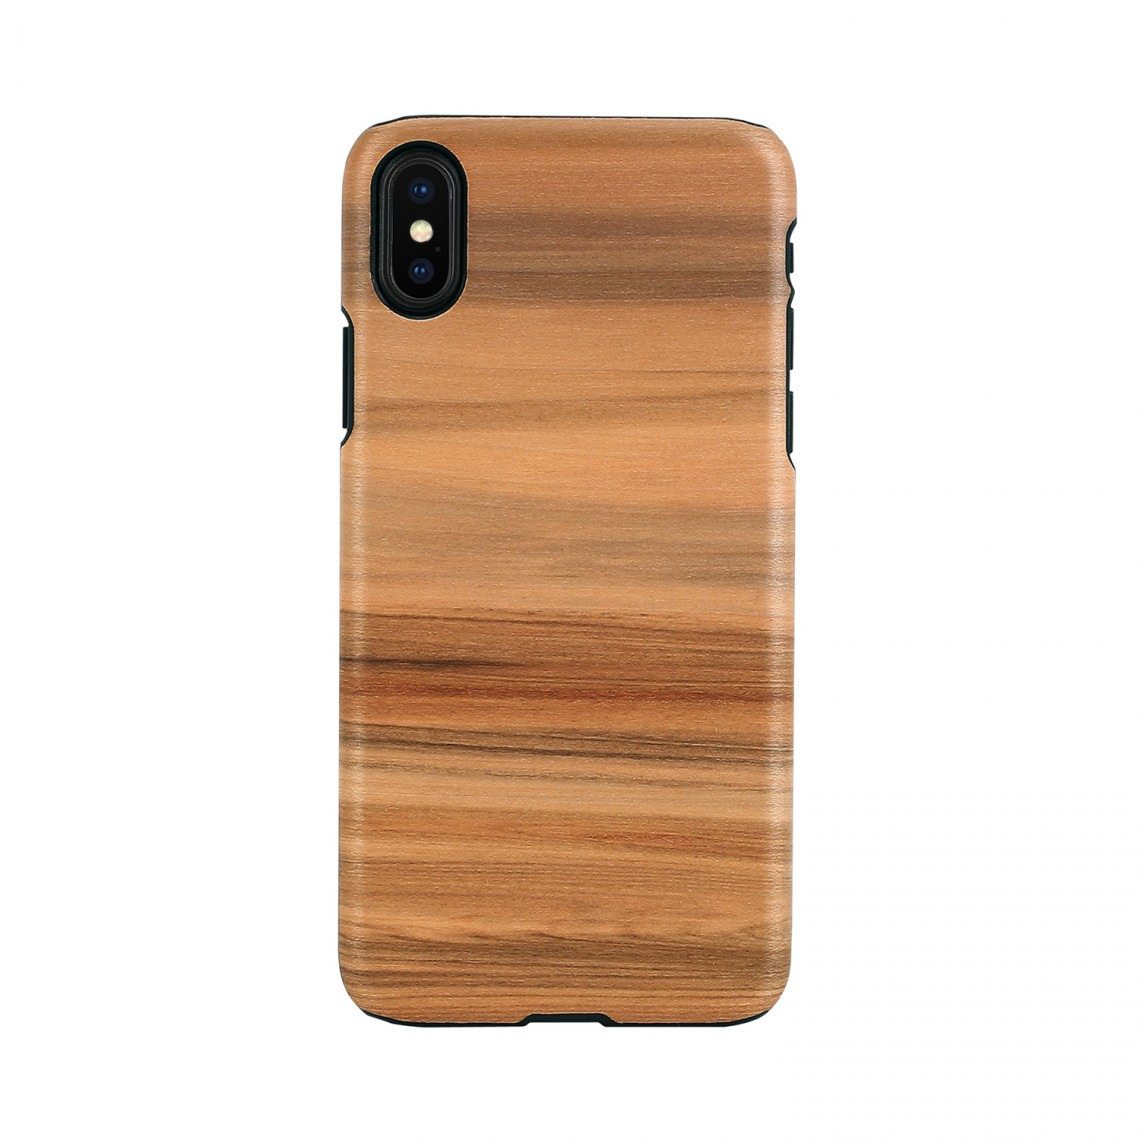 iPhone XS Max ケース 天然木 Man&Wood Cappuccino(マンアンドウッド カプチーノ)